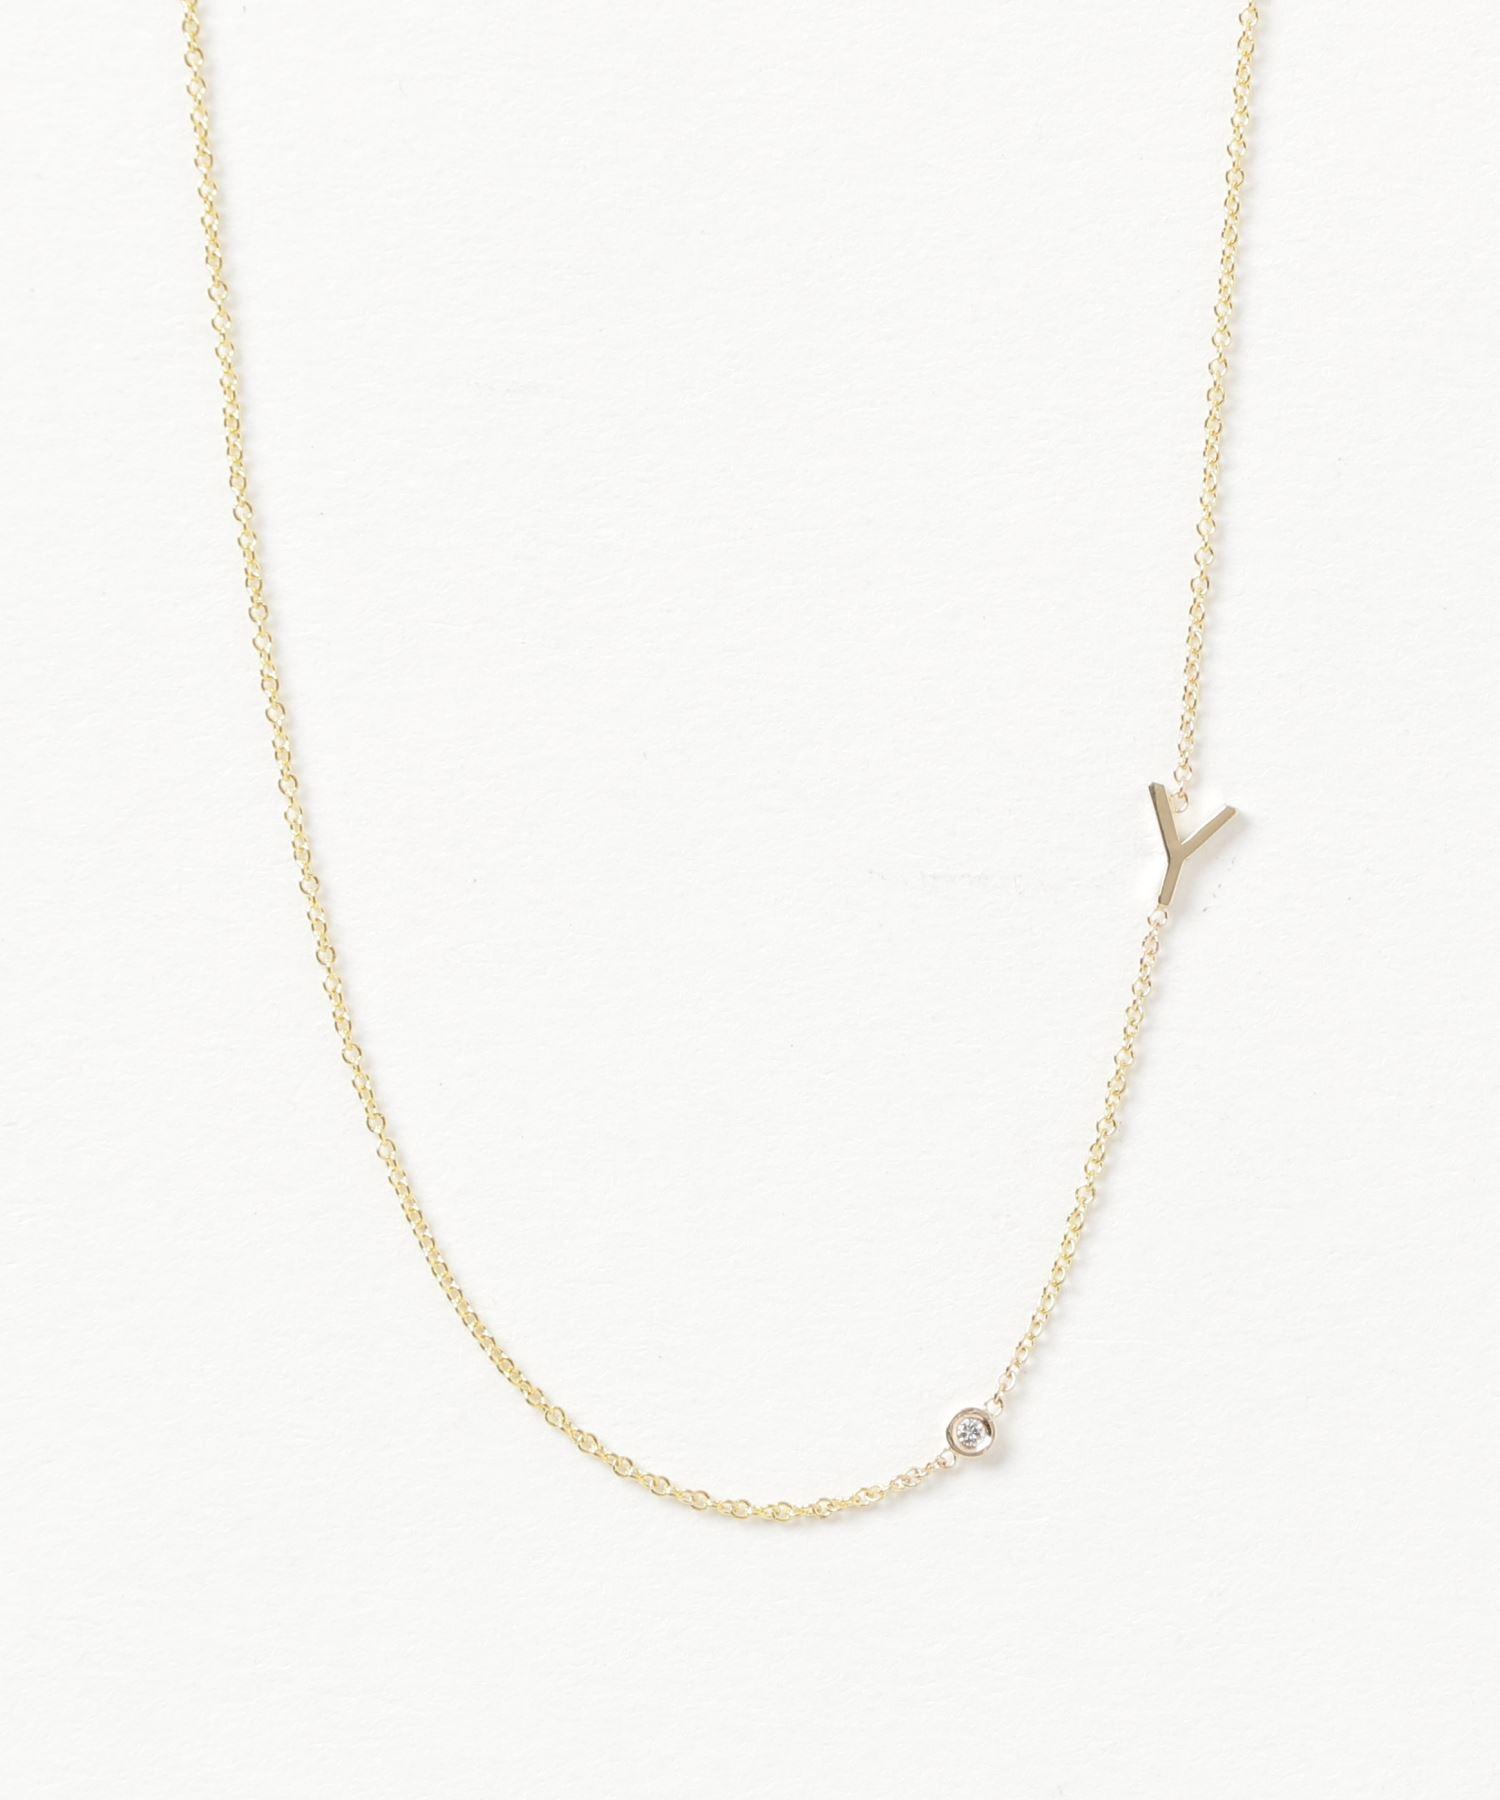 Maya Brenner Designs 14KYG MiniLetter Necklace with Diamond/Y